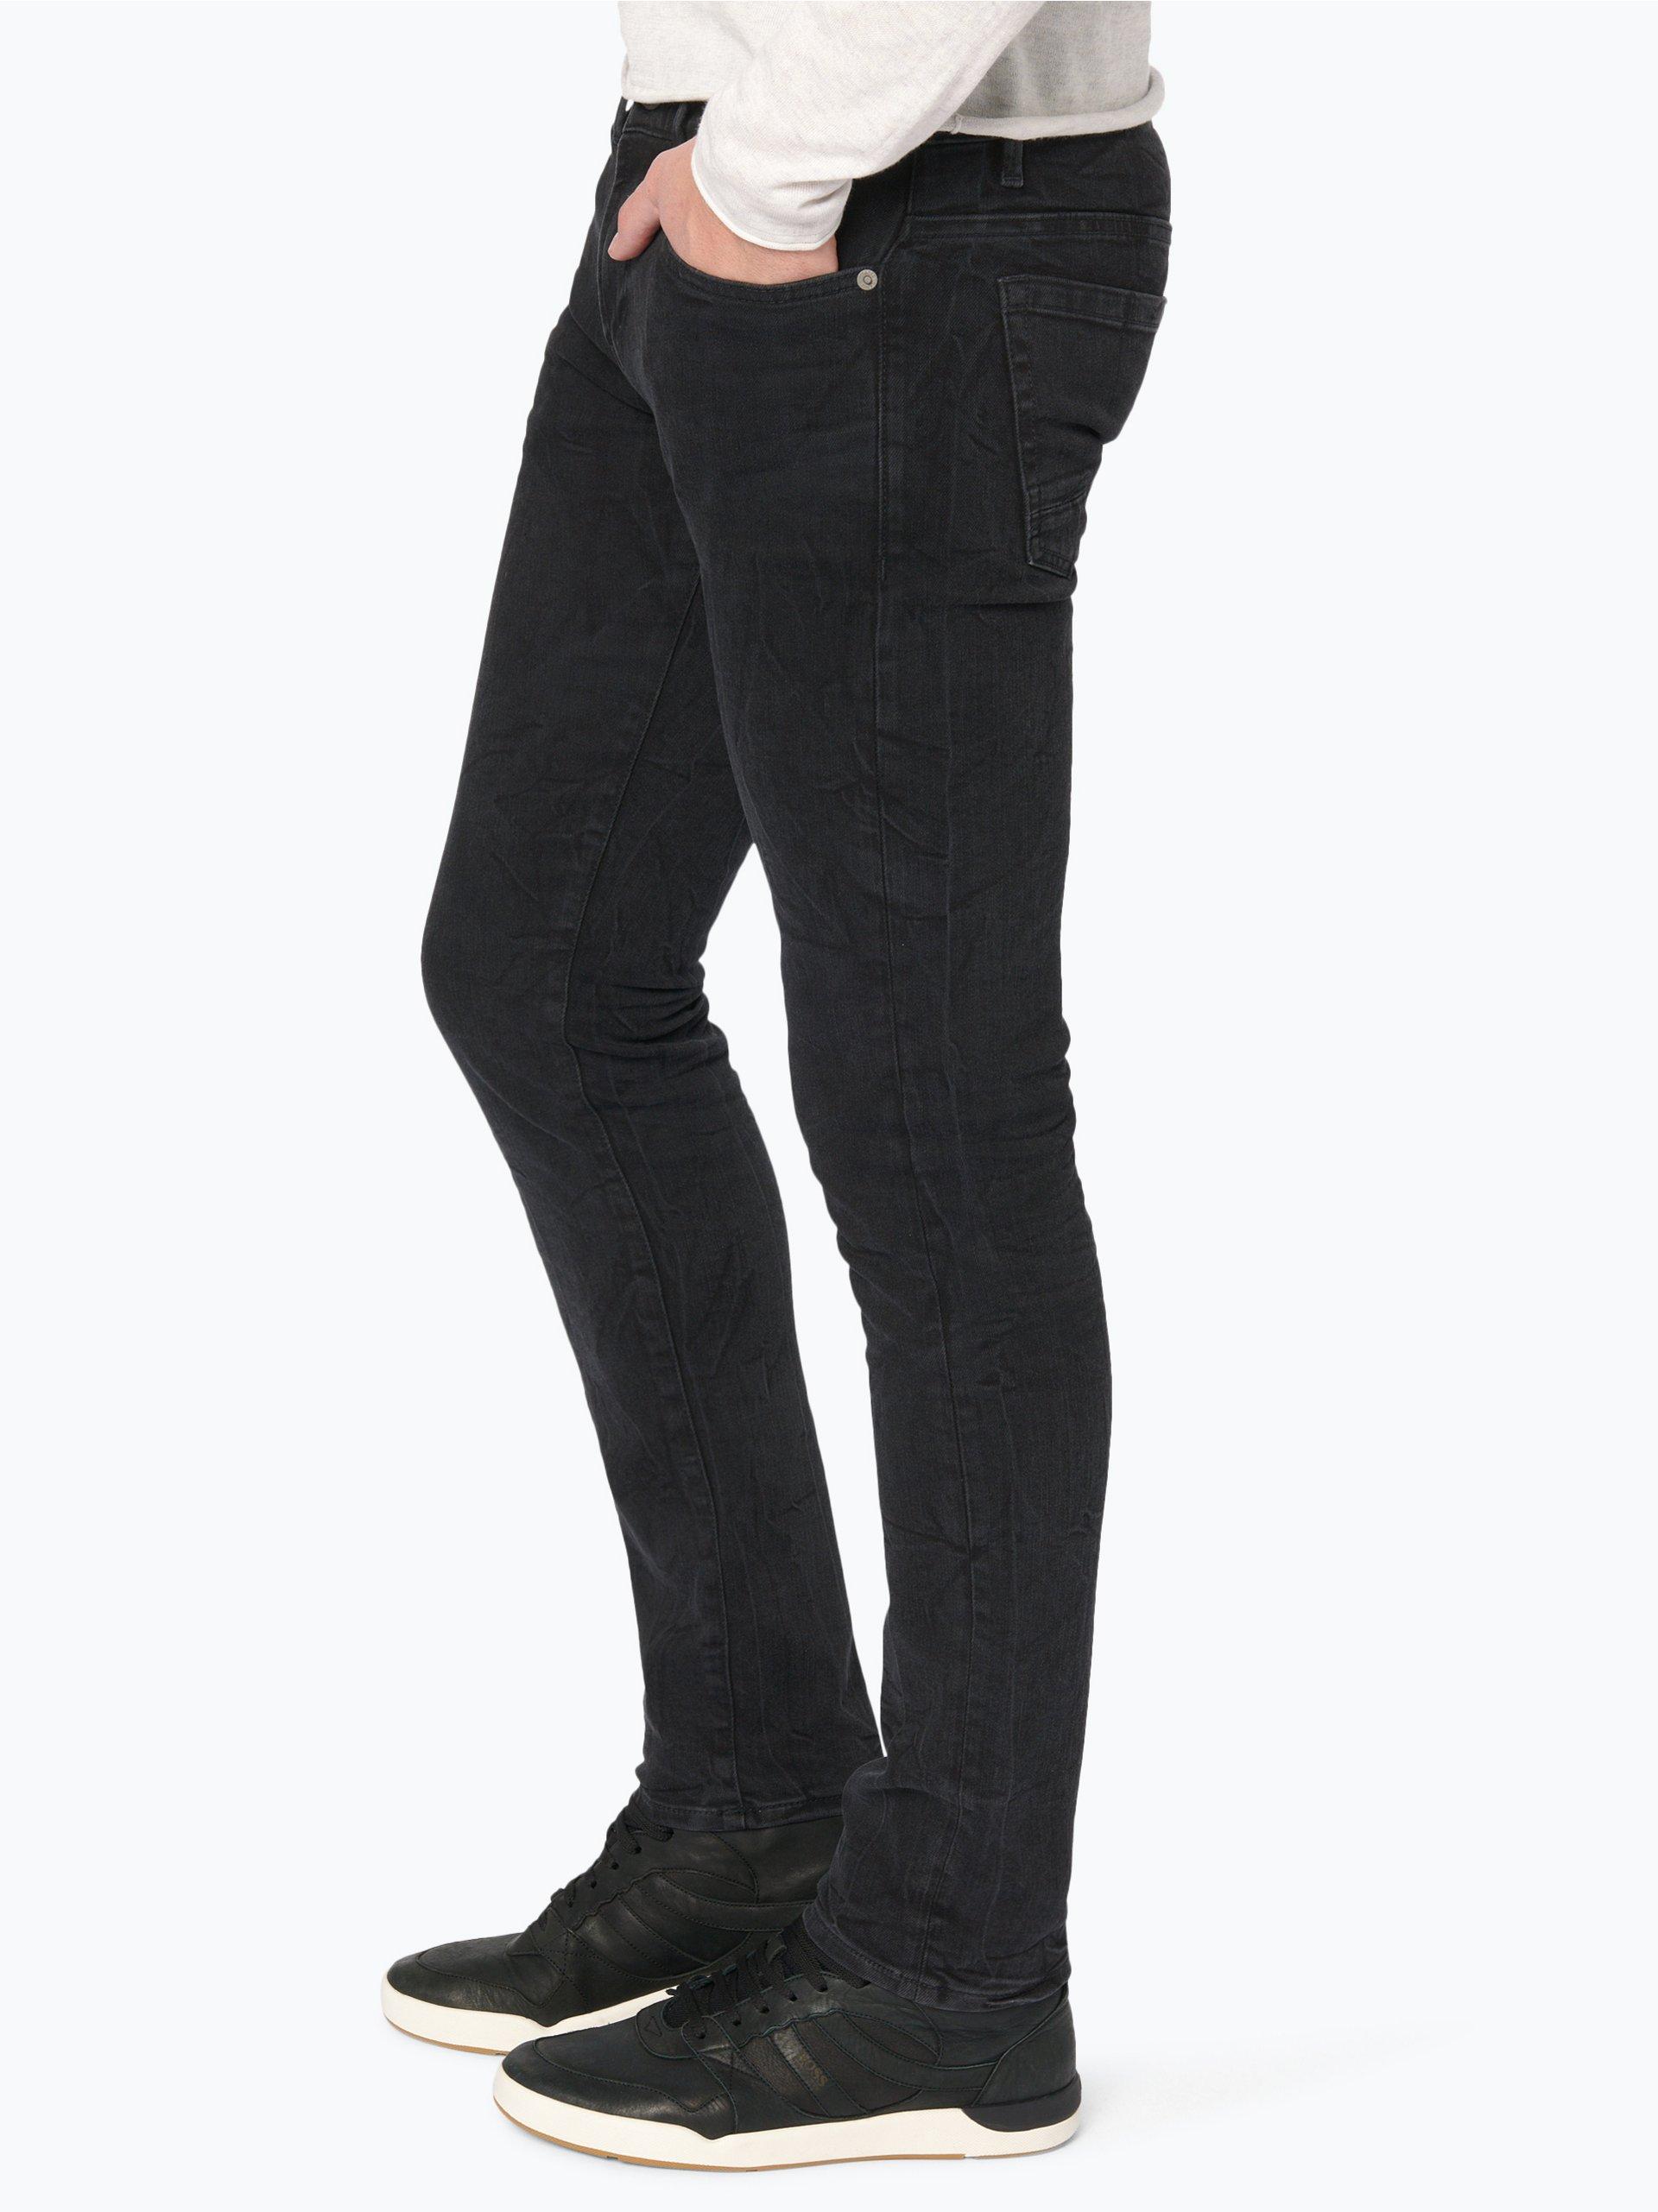 boss orange herren jeans orange 72 schwarz uni online kaufen vangraaf com. Black Bedroom Furniture Sets. Home Design Ideas